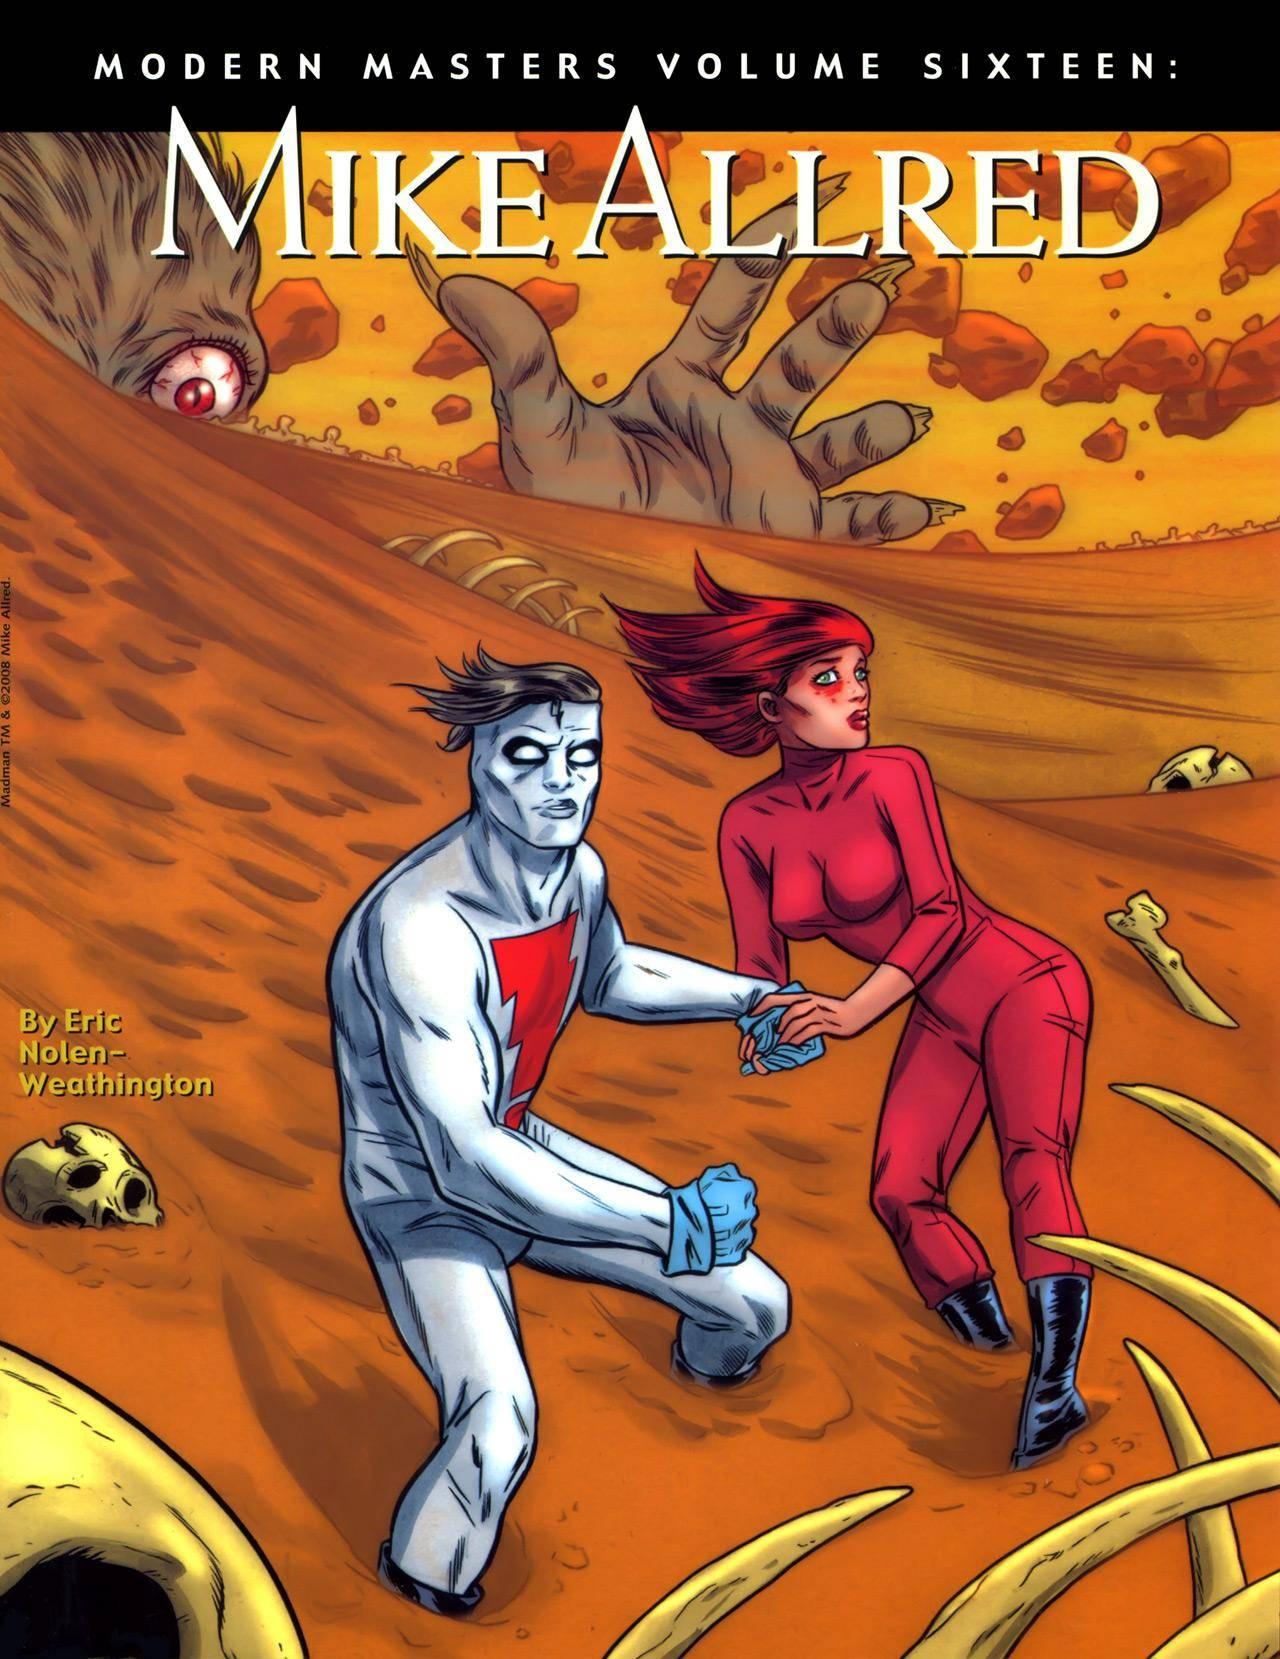 Modern Masters Vol 16 - Mike Allred ArtNet - DCP